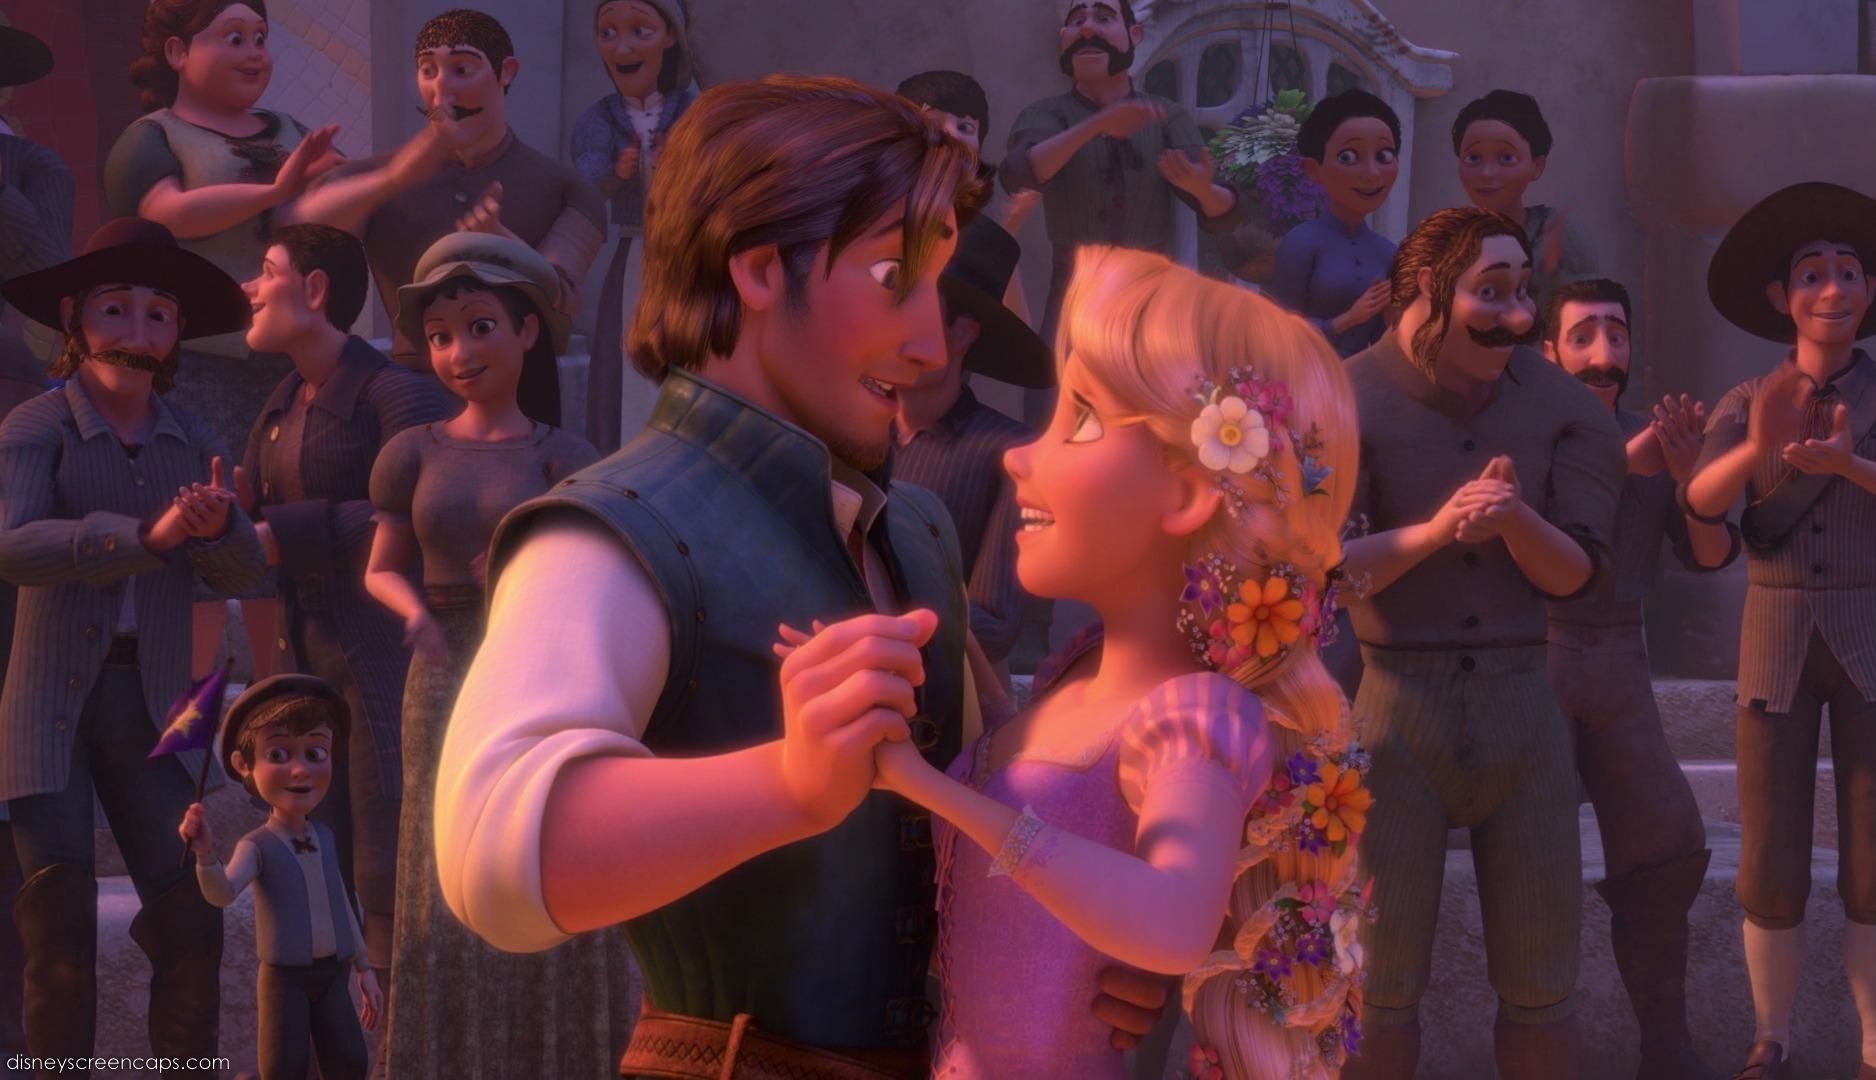 Tangled Movie Screencap 2010 Rapunzel And Flynn Image